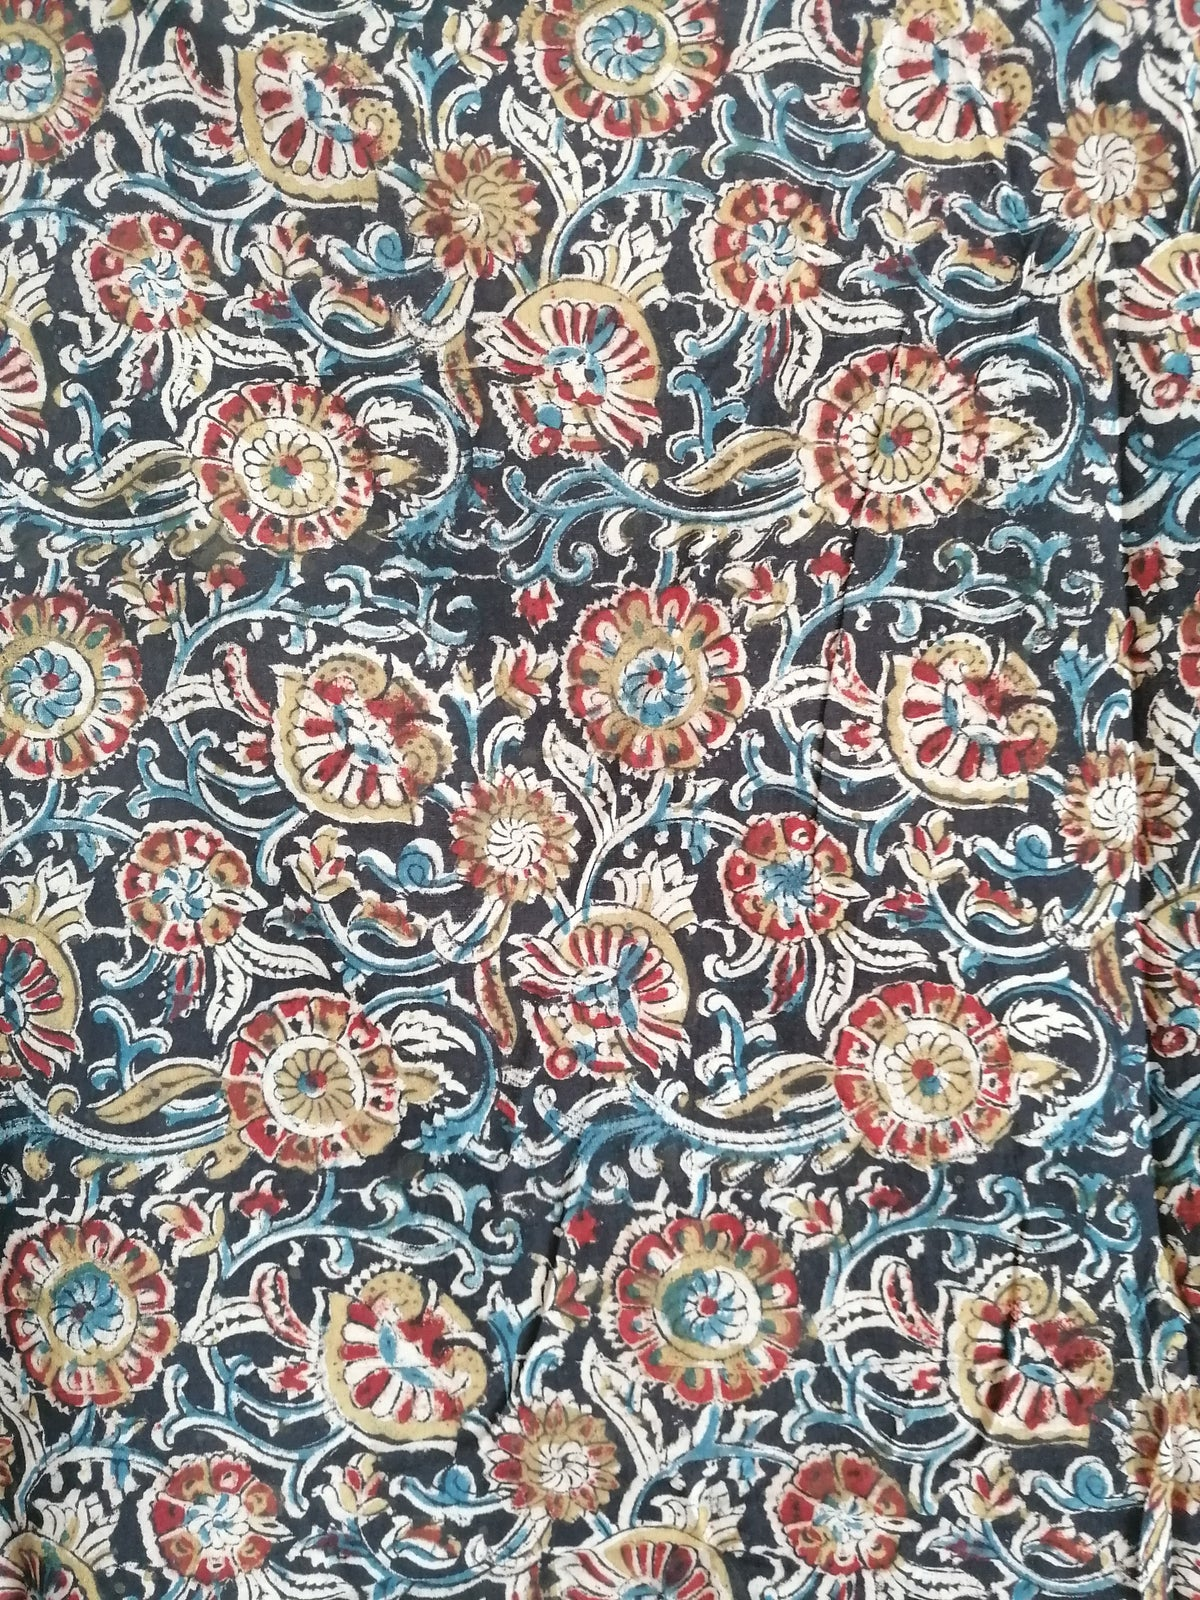 Image of Namasté fabric kalamkari noir pointe de rouge